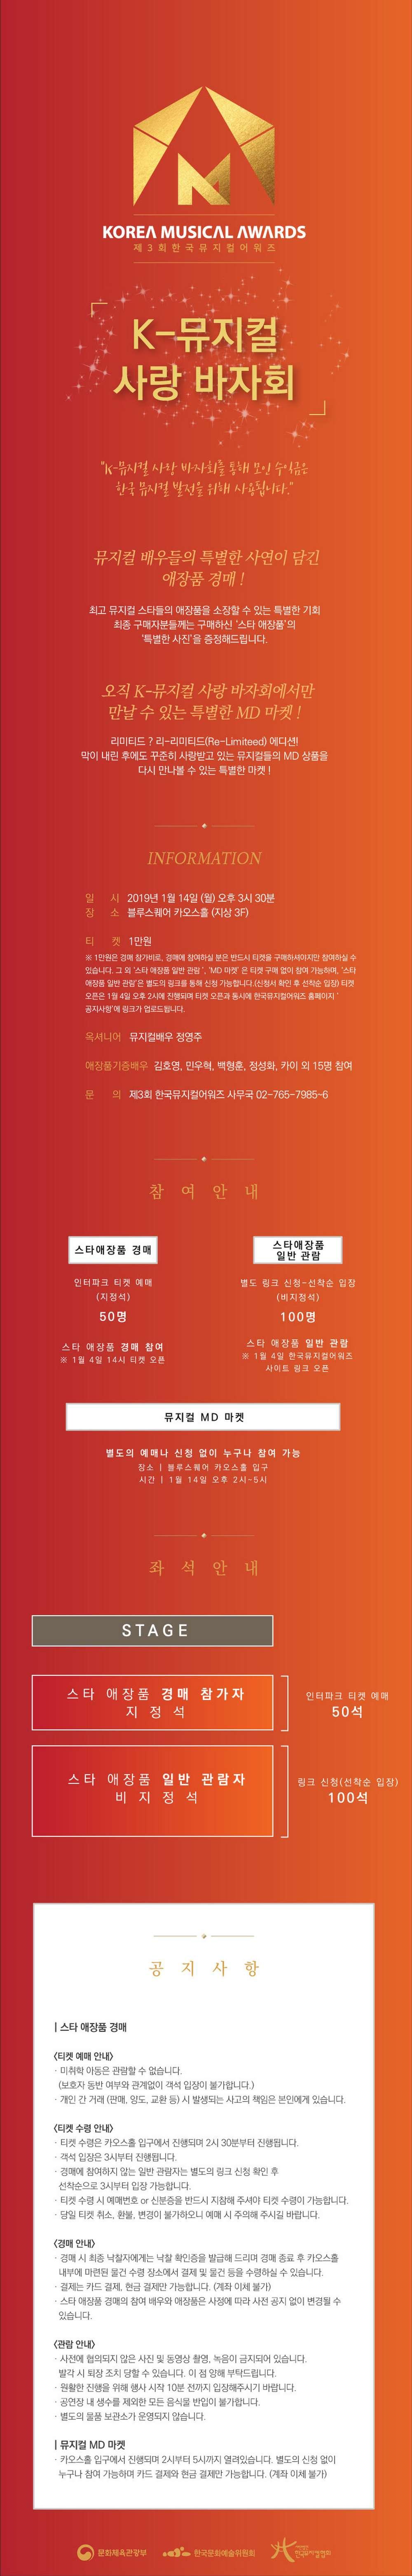 K뮤지컬사랑바자회웹상세수정